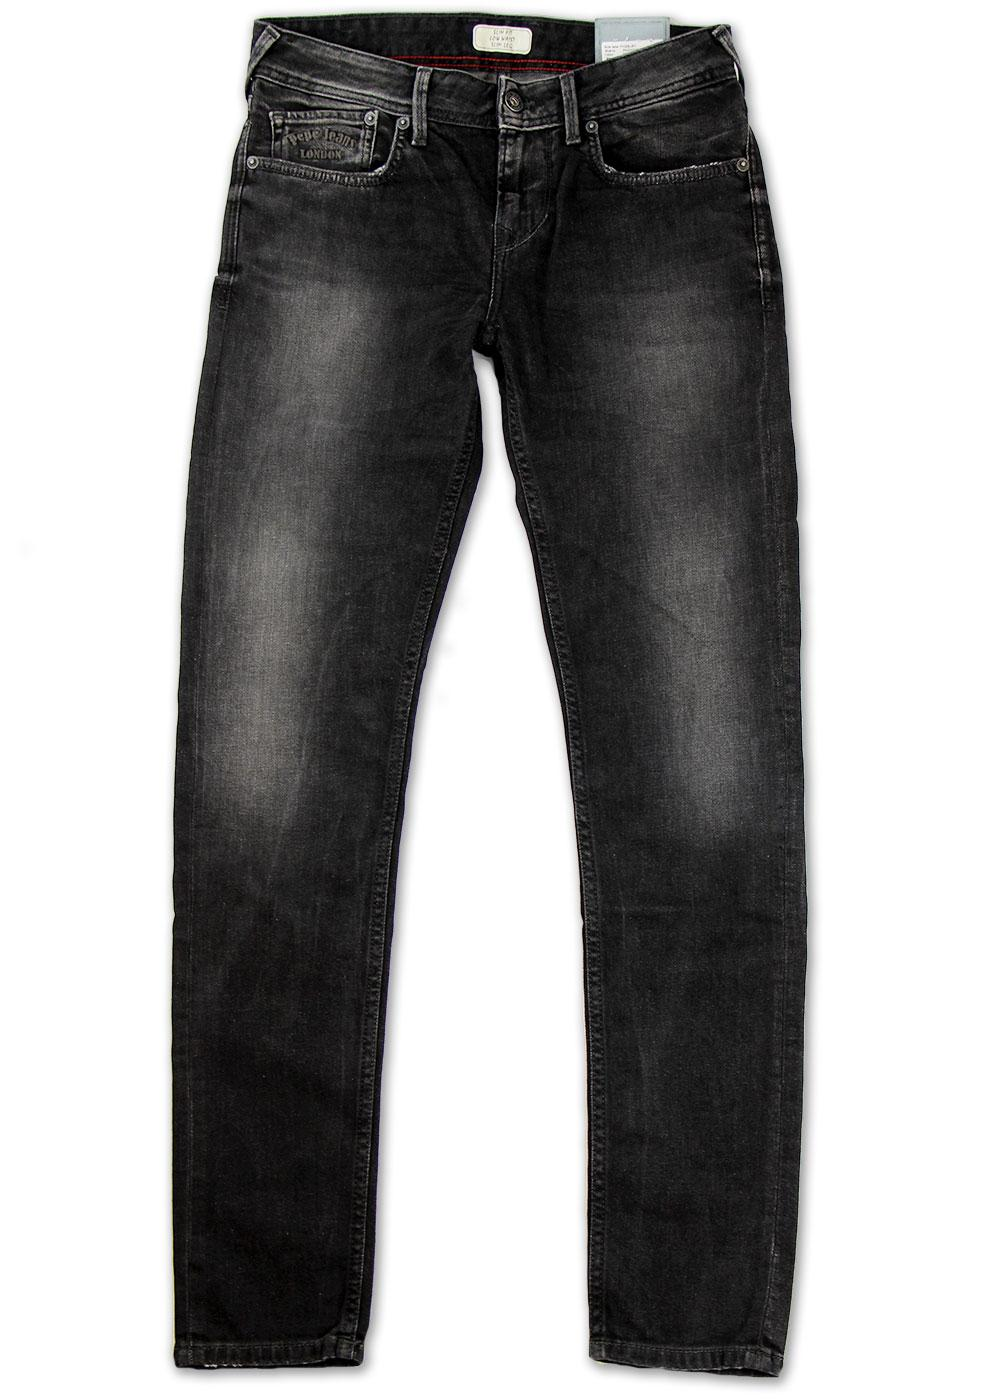 Finsbury PEPE Retro Indie Mod Drainpipe Jeans (B)